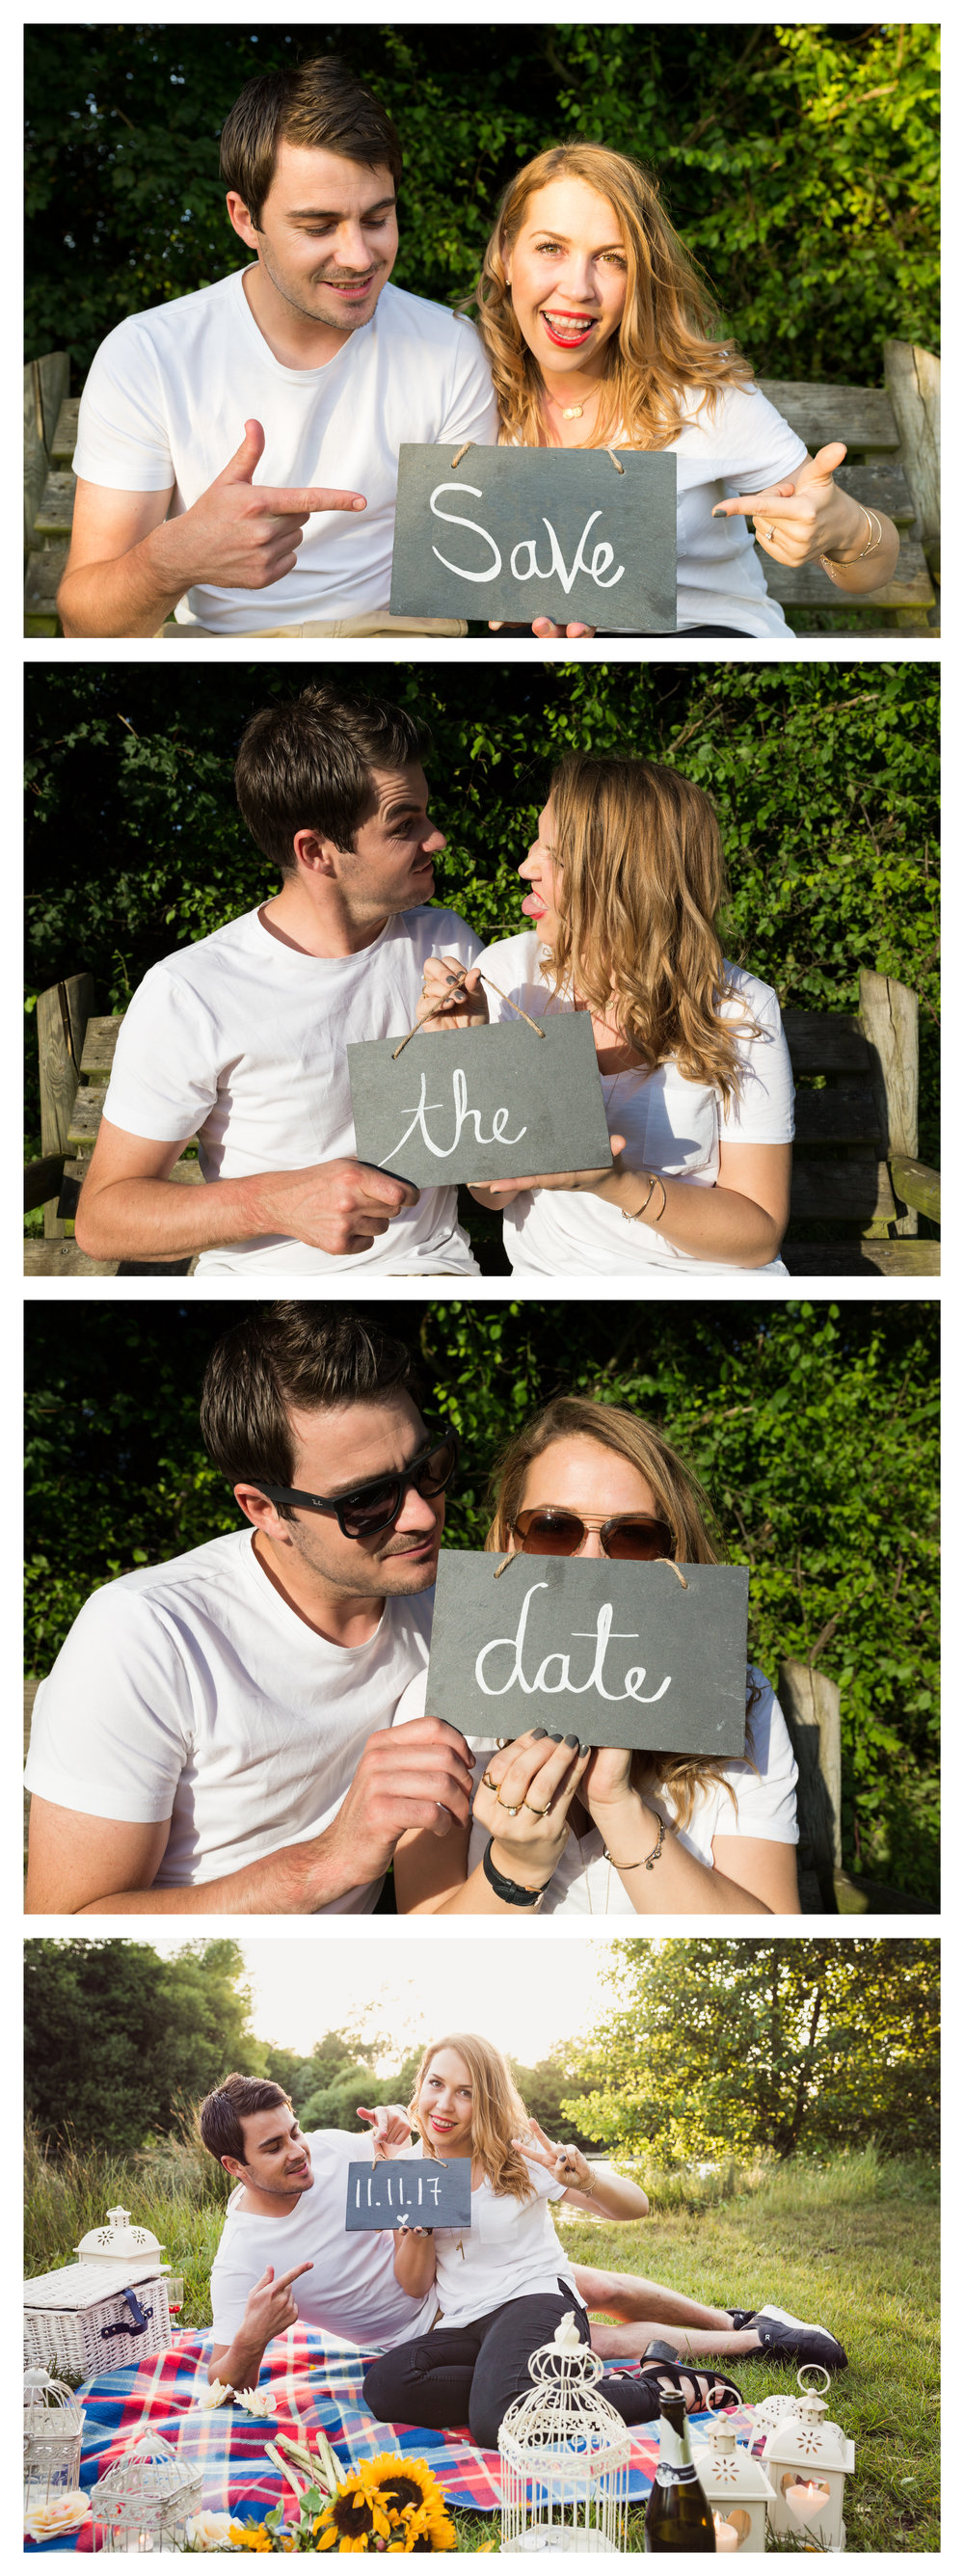 Save the Date Image of Lacey & Dan Harris' Engagement Photoshoot in Heybridge, Maldon